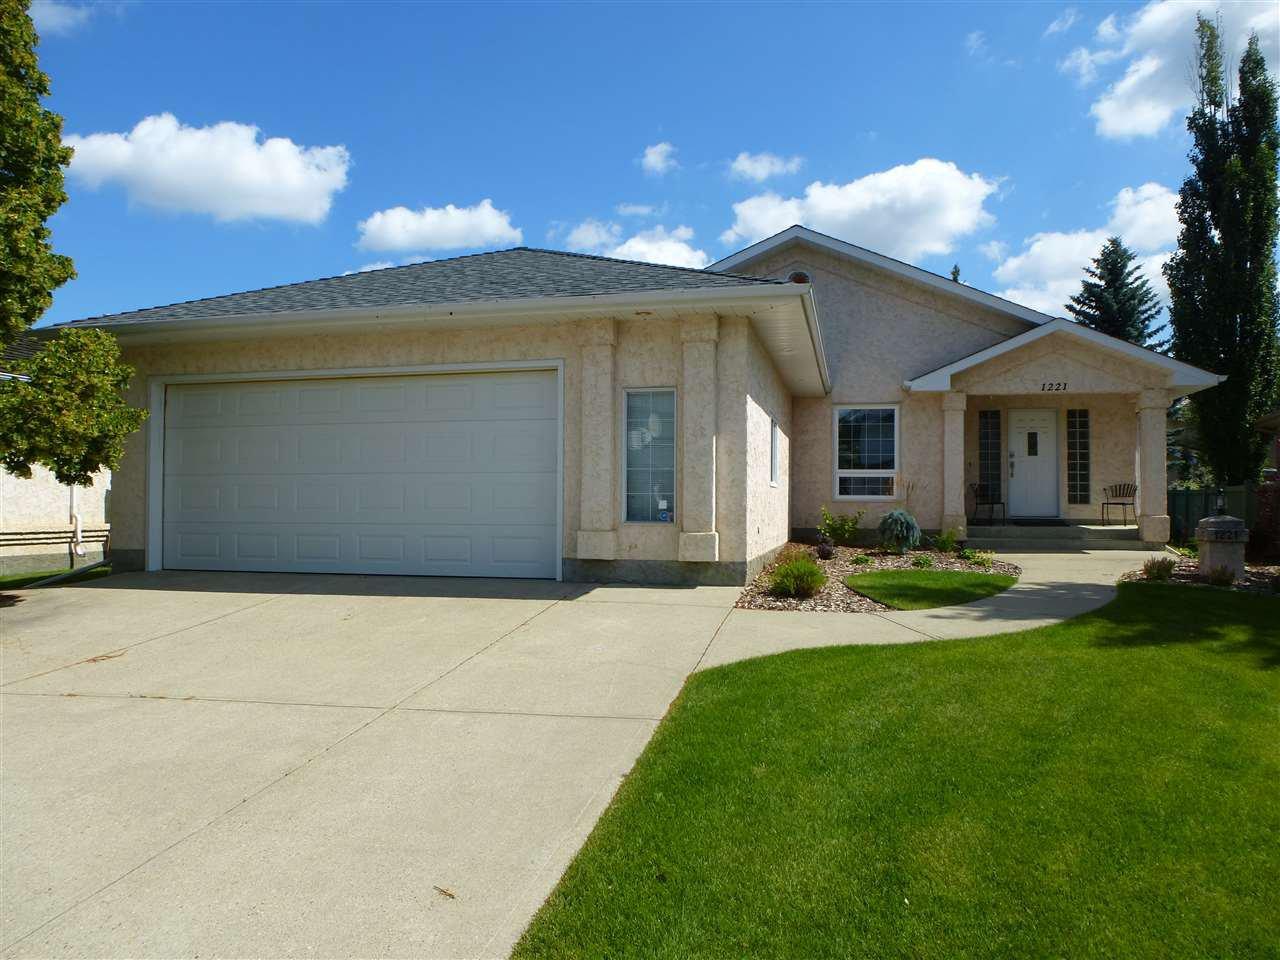 Main Photo: 1221 WERSHOF Road in Edmonton: Zone 20 House for sale : MLS®# E4198642